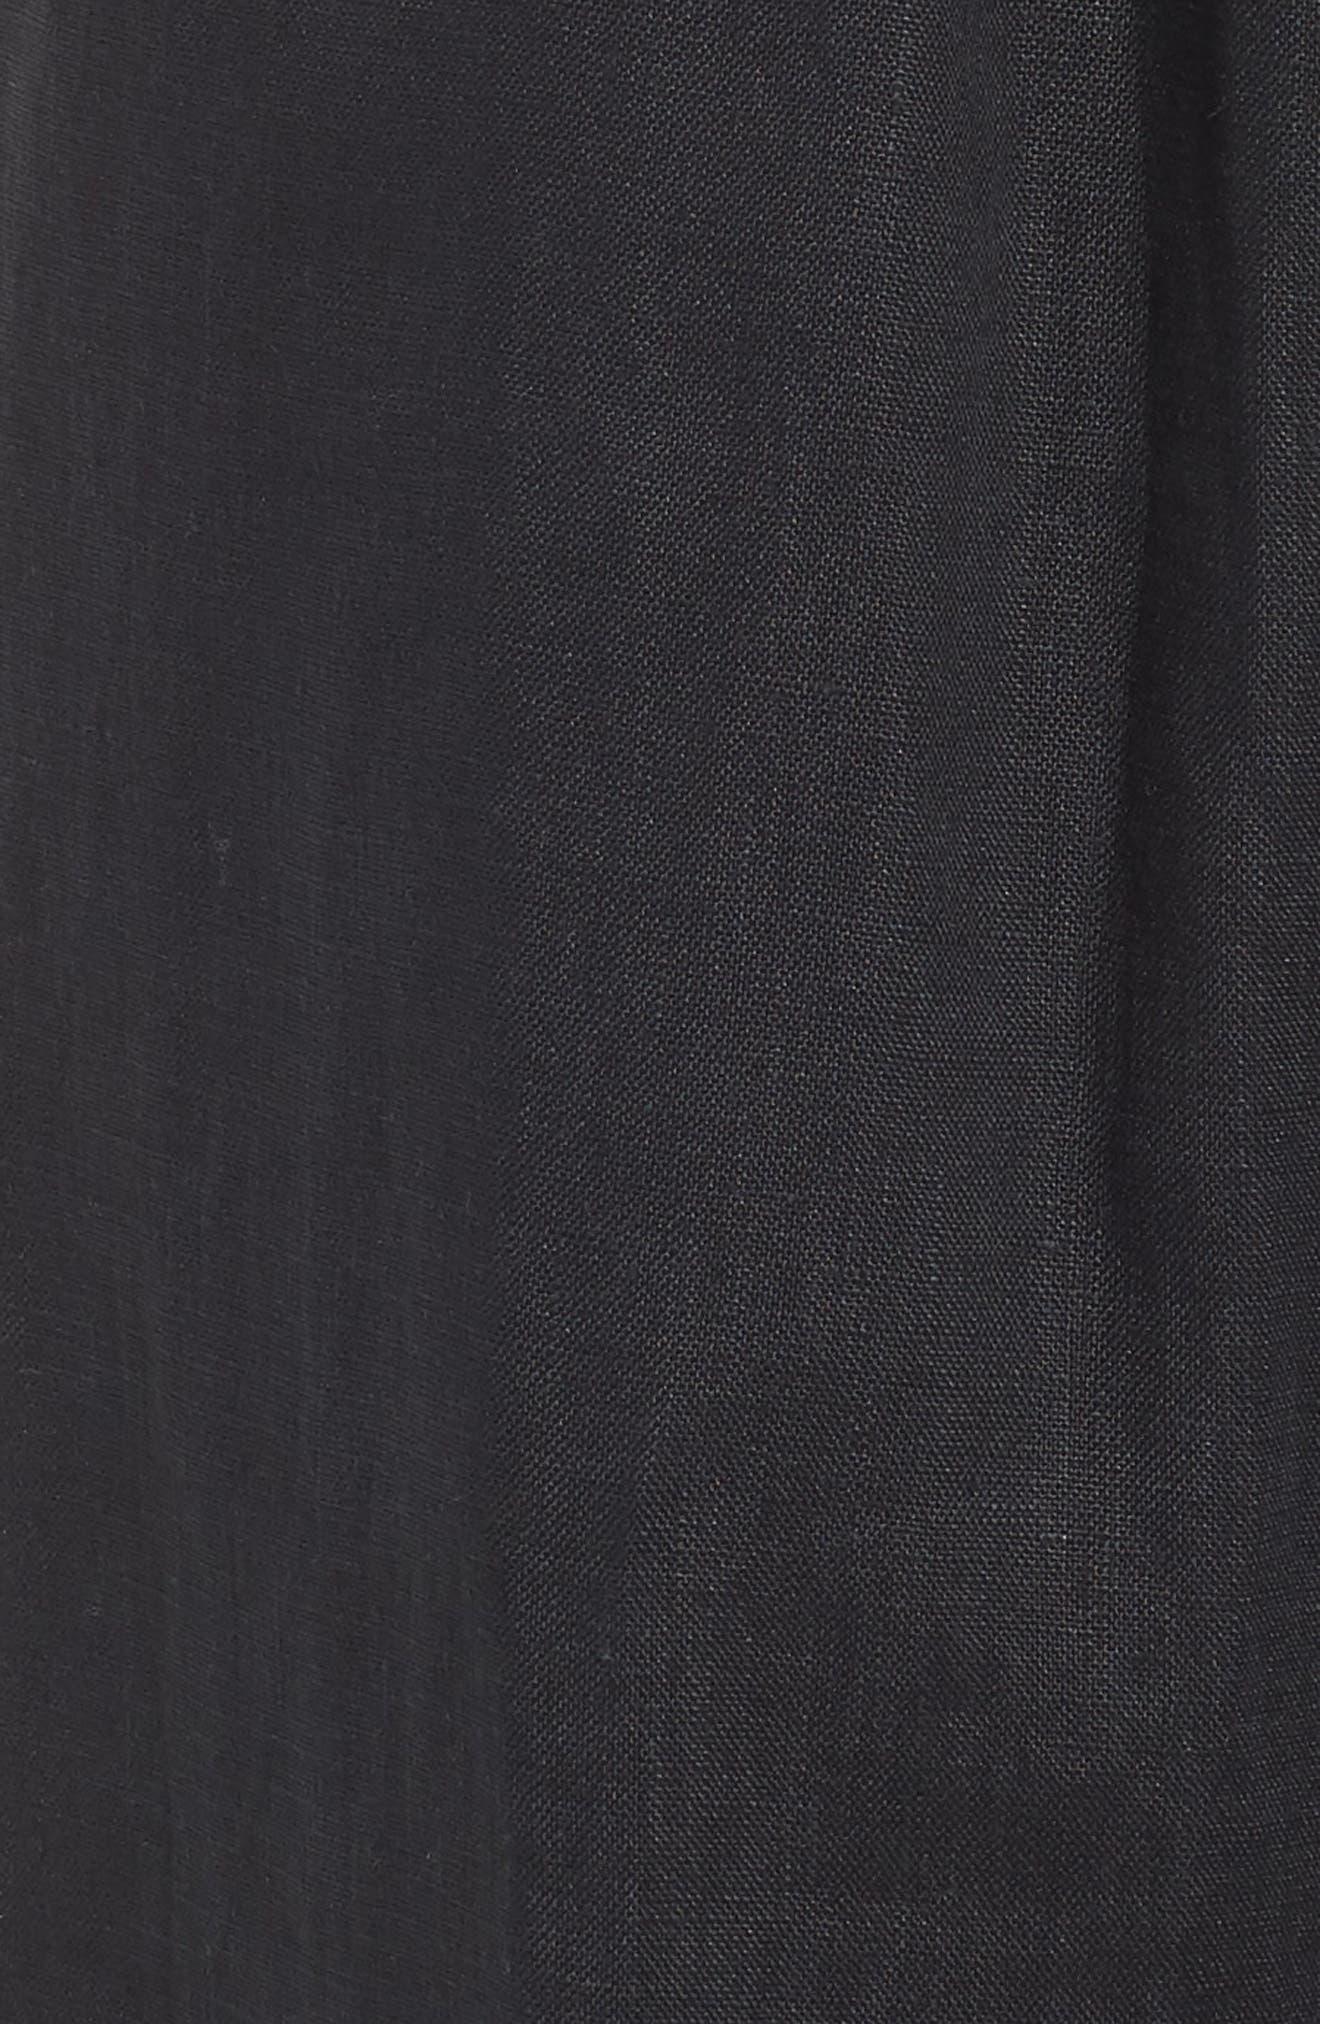 Varadero High Waist Linen Pants,                             Alternate thumbnail 6, color,                             001